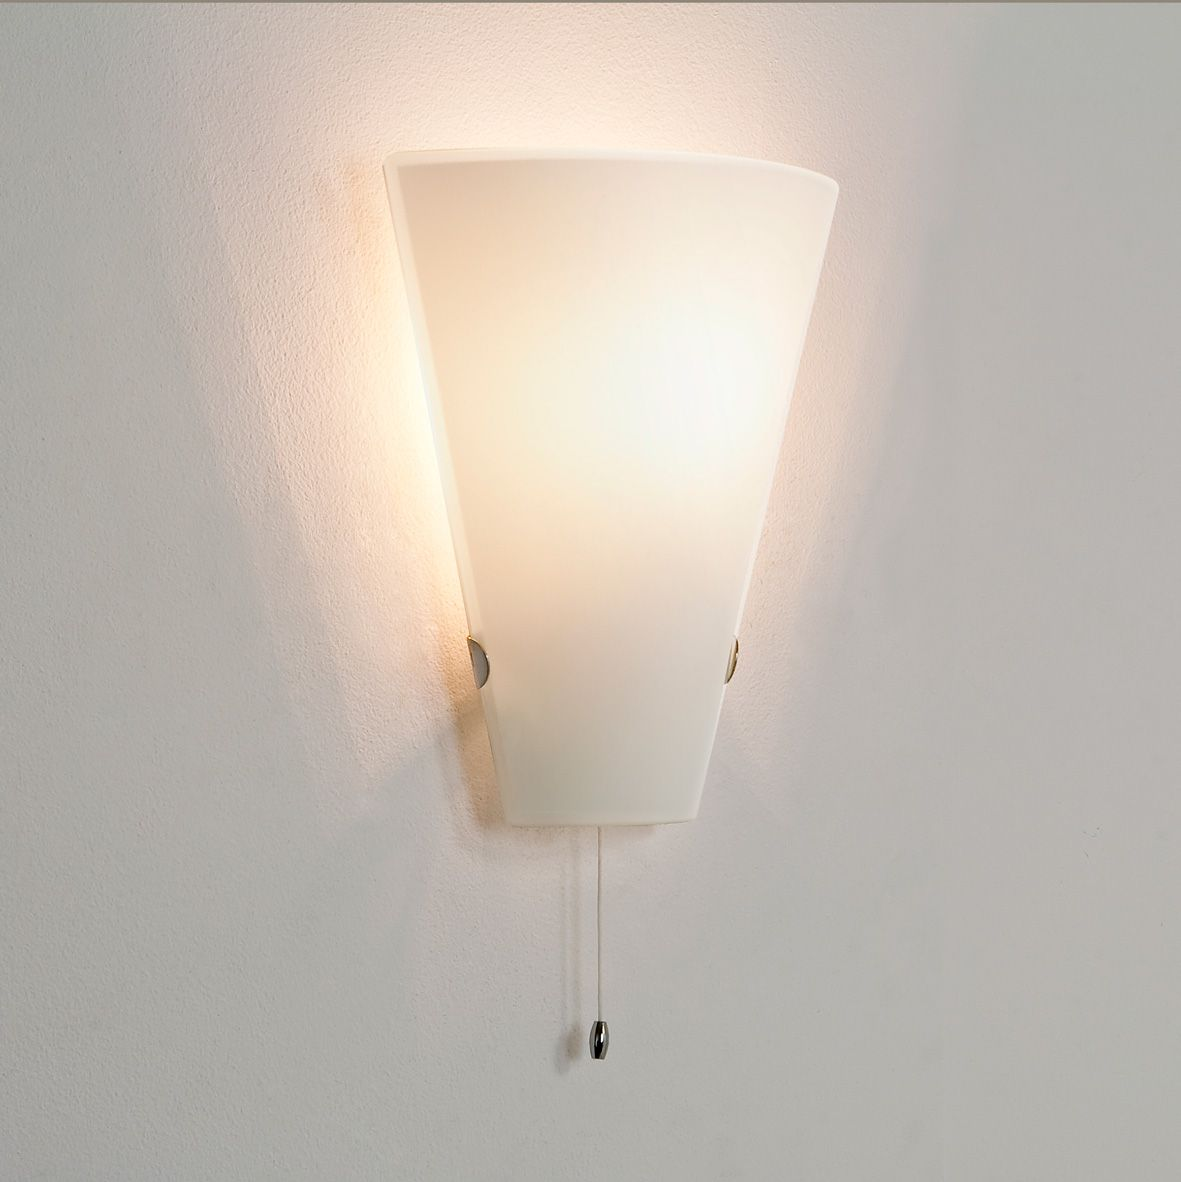 Astro Taper 0248 Dimmable Pull Cord Switch Wall Light 60w E14 Lamp Ip20 Glass Wandbeleuchtung Innenbeleuchtung Wandleuchte